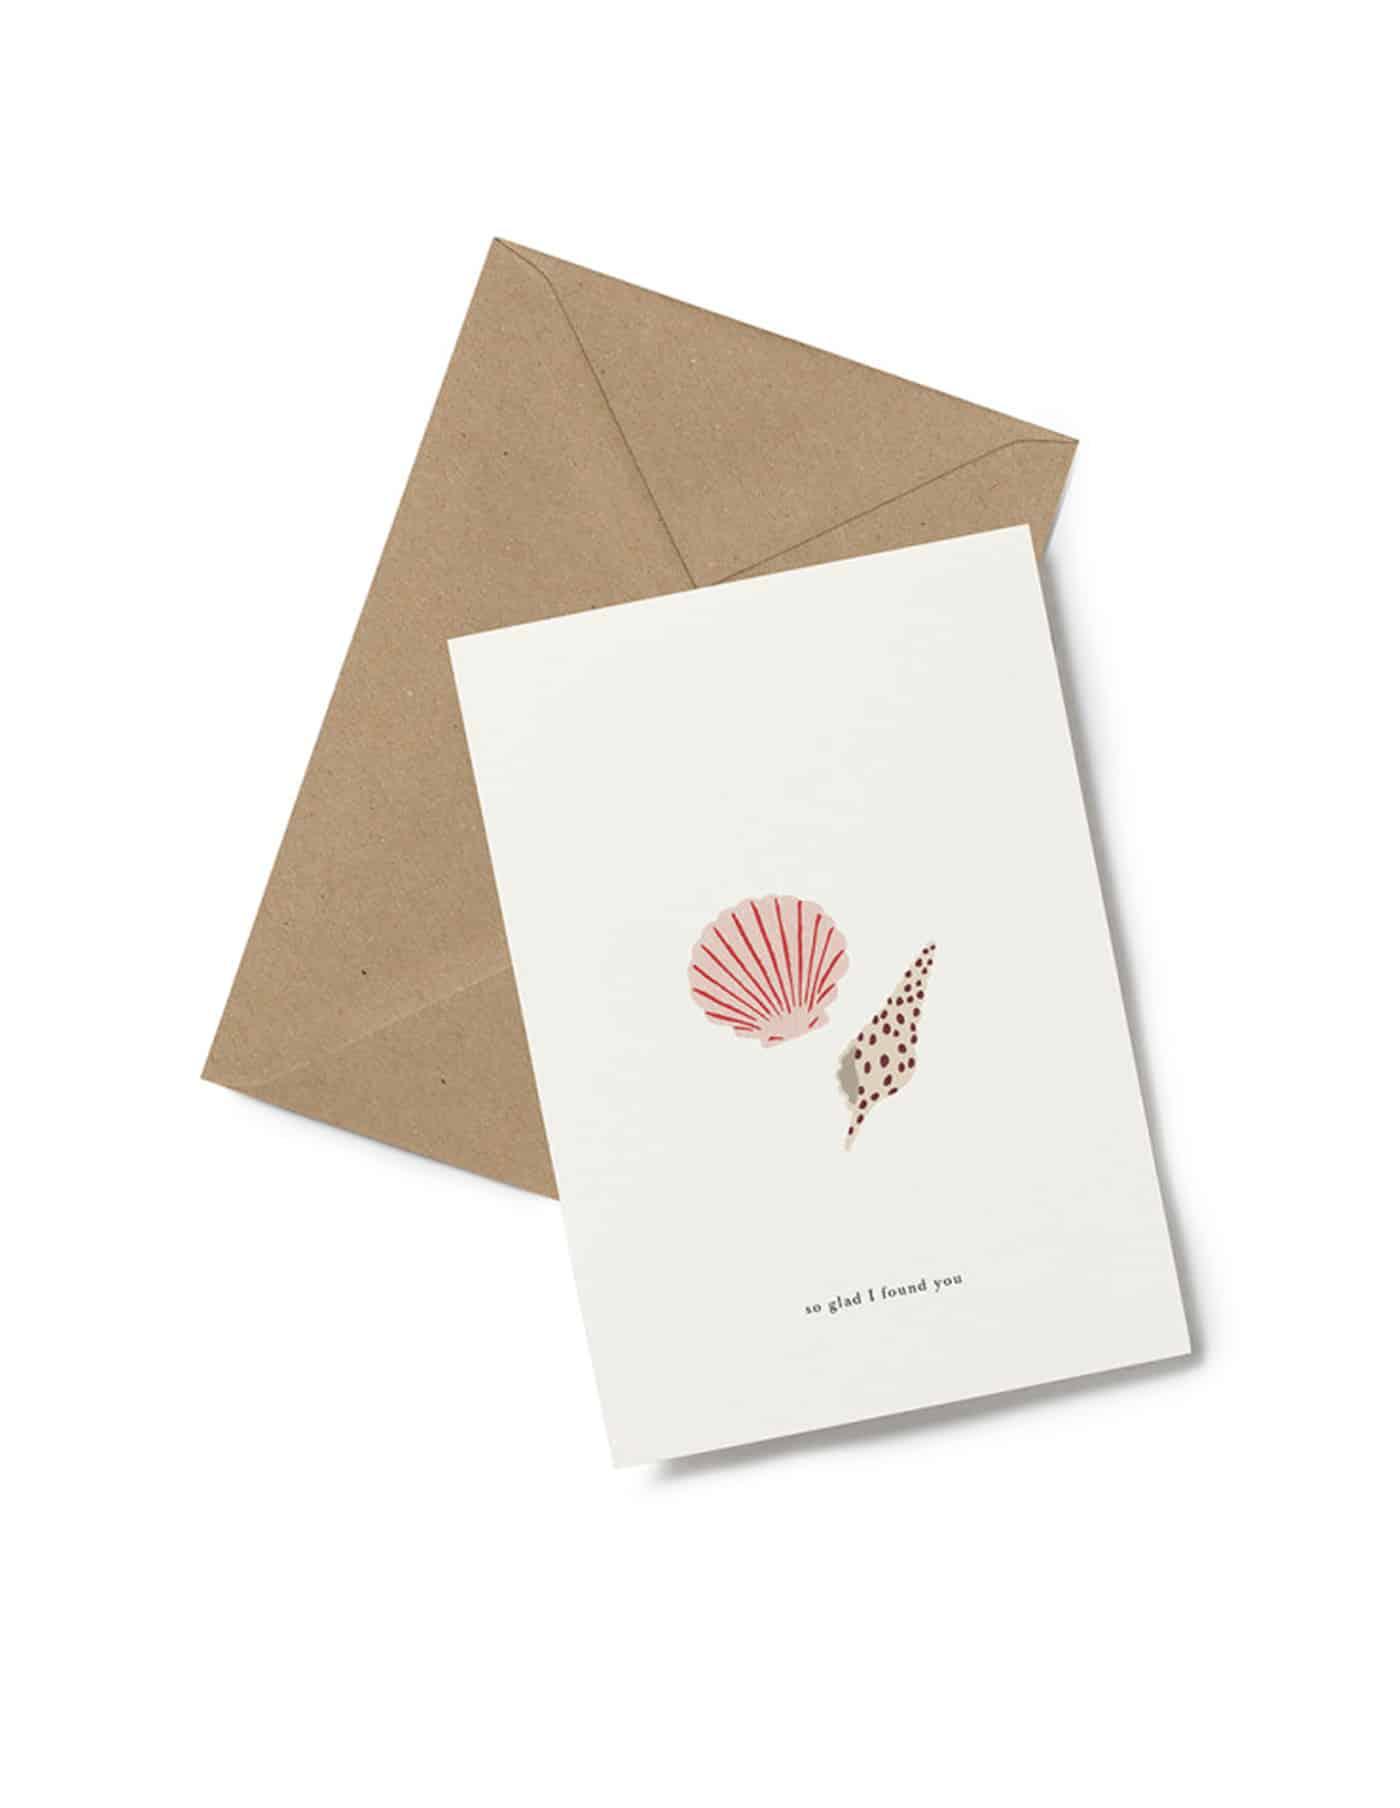 Kartotek 'so glad' Greeting Card